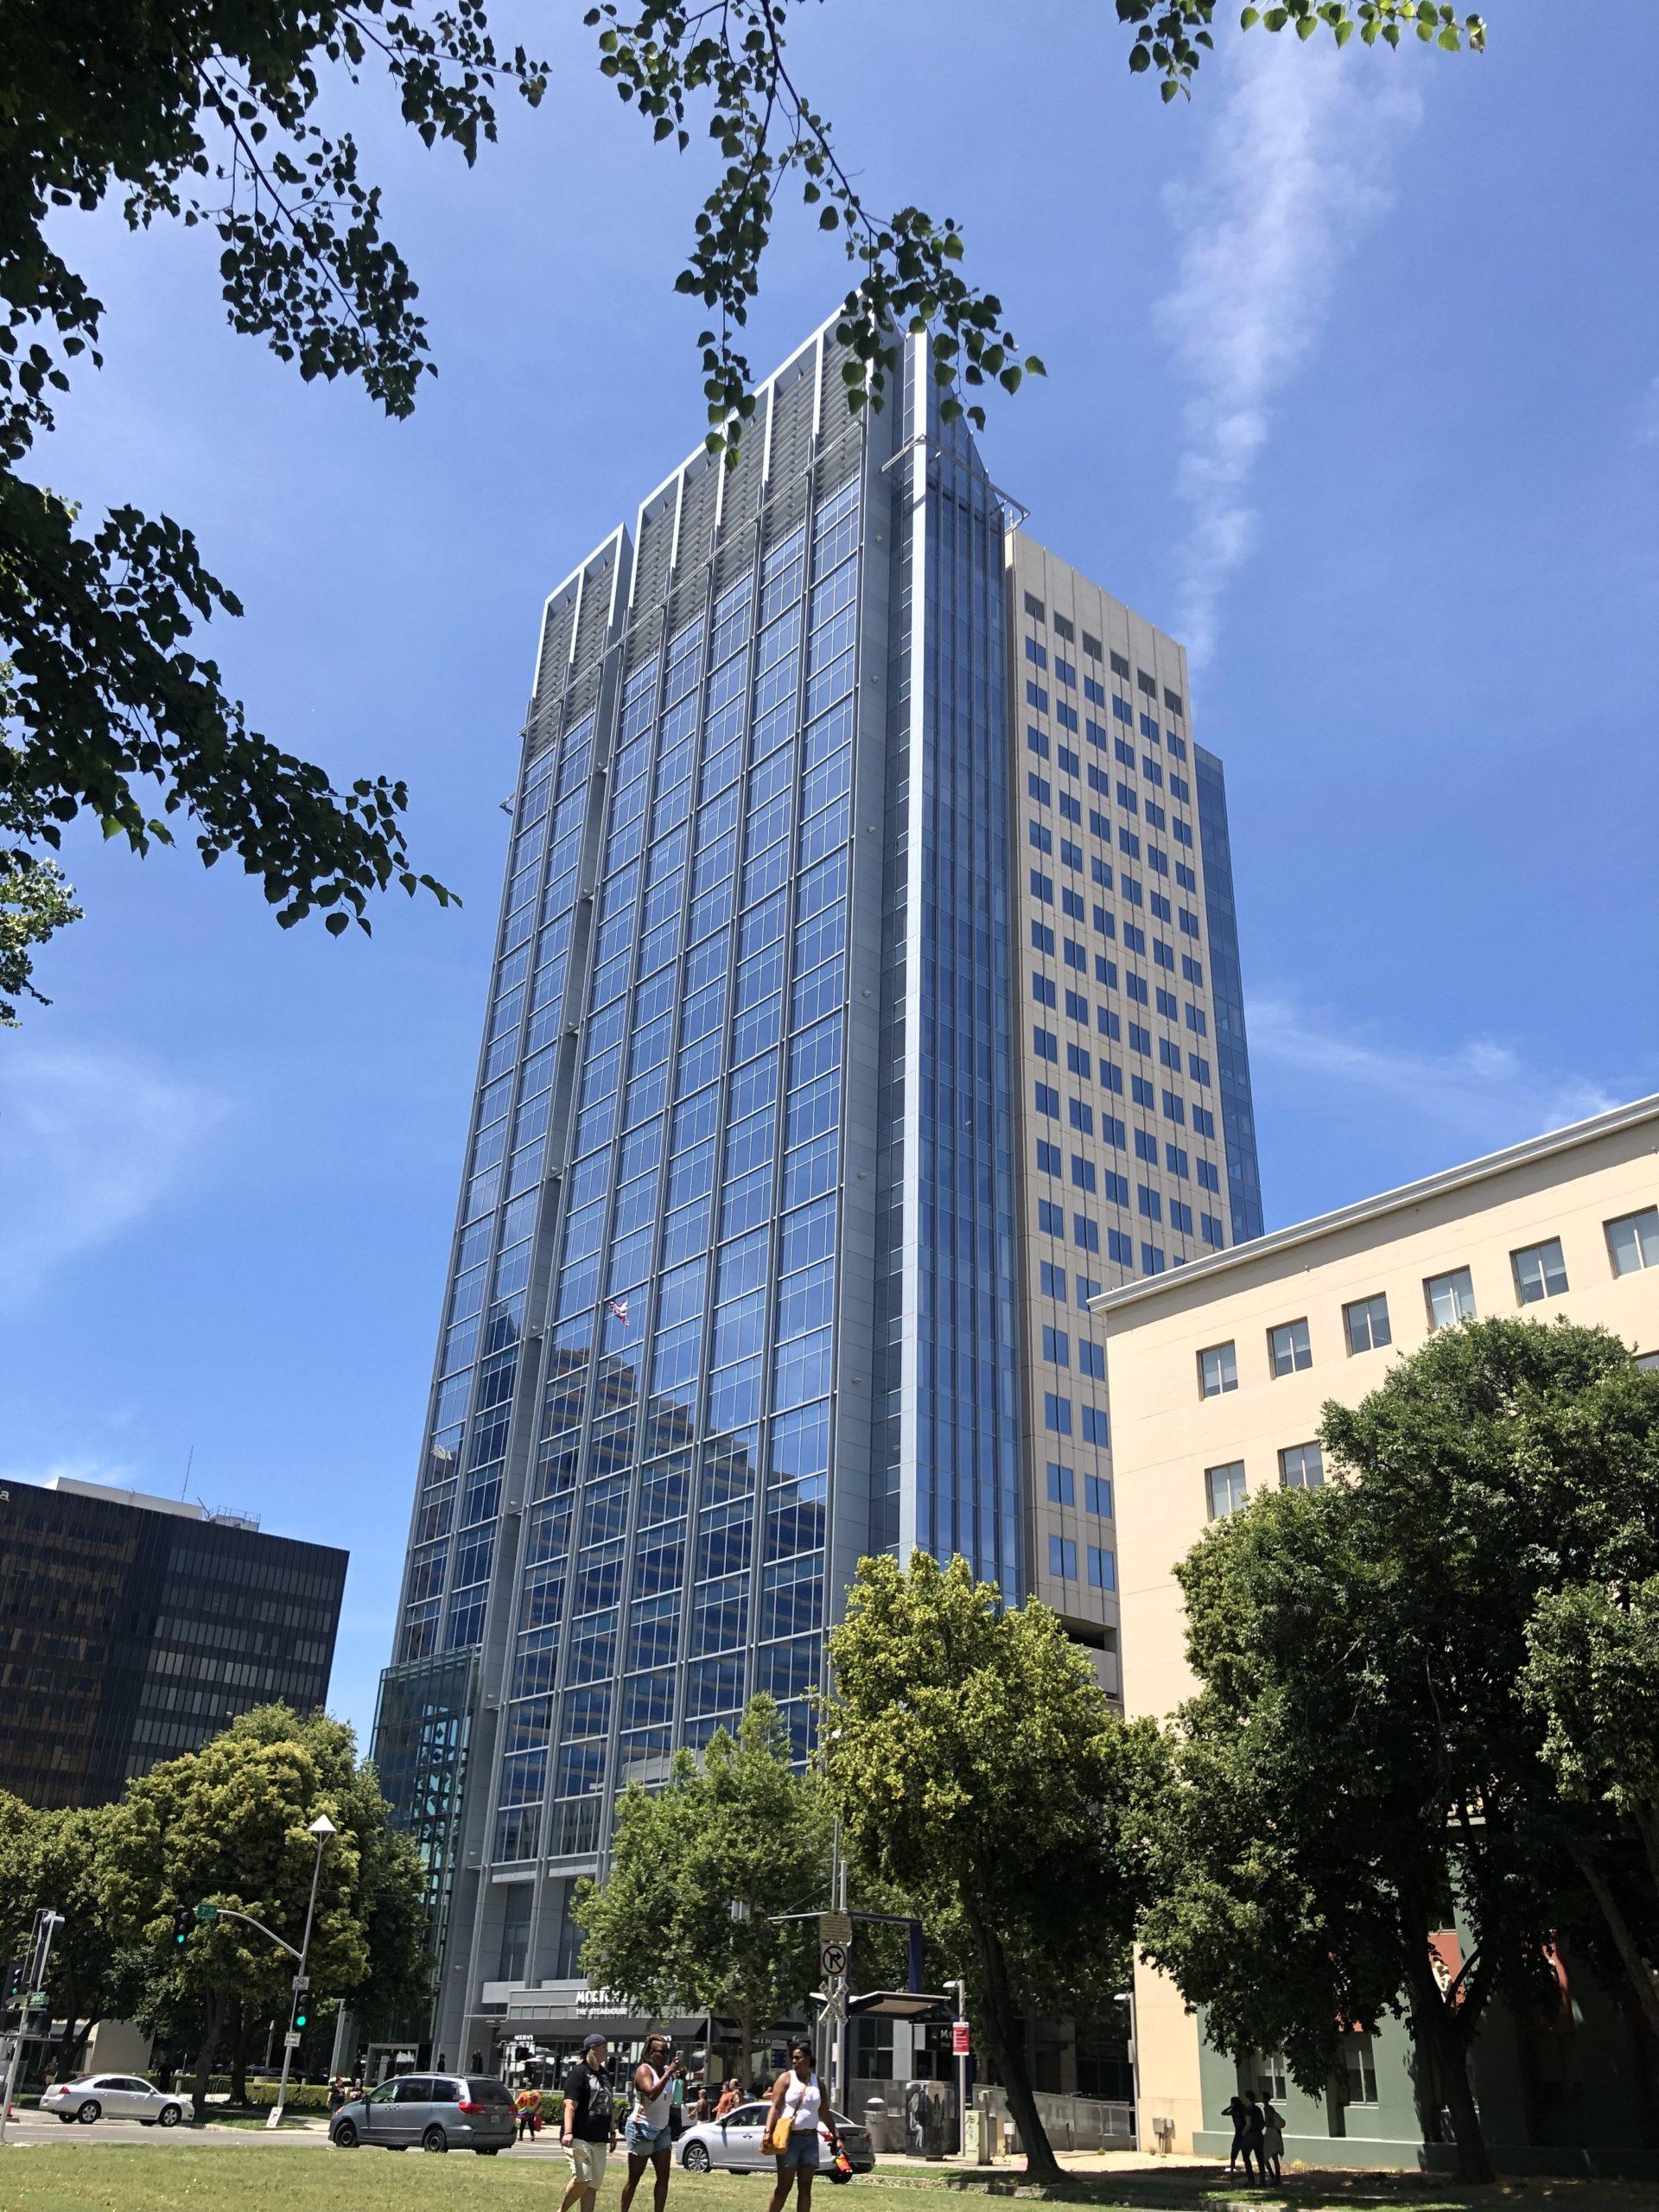 Sacramento Commercial Real Estate Owner Services